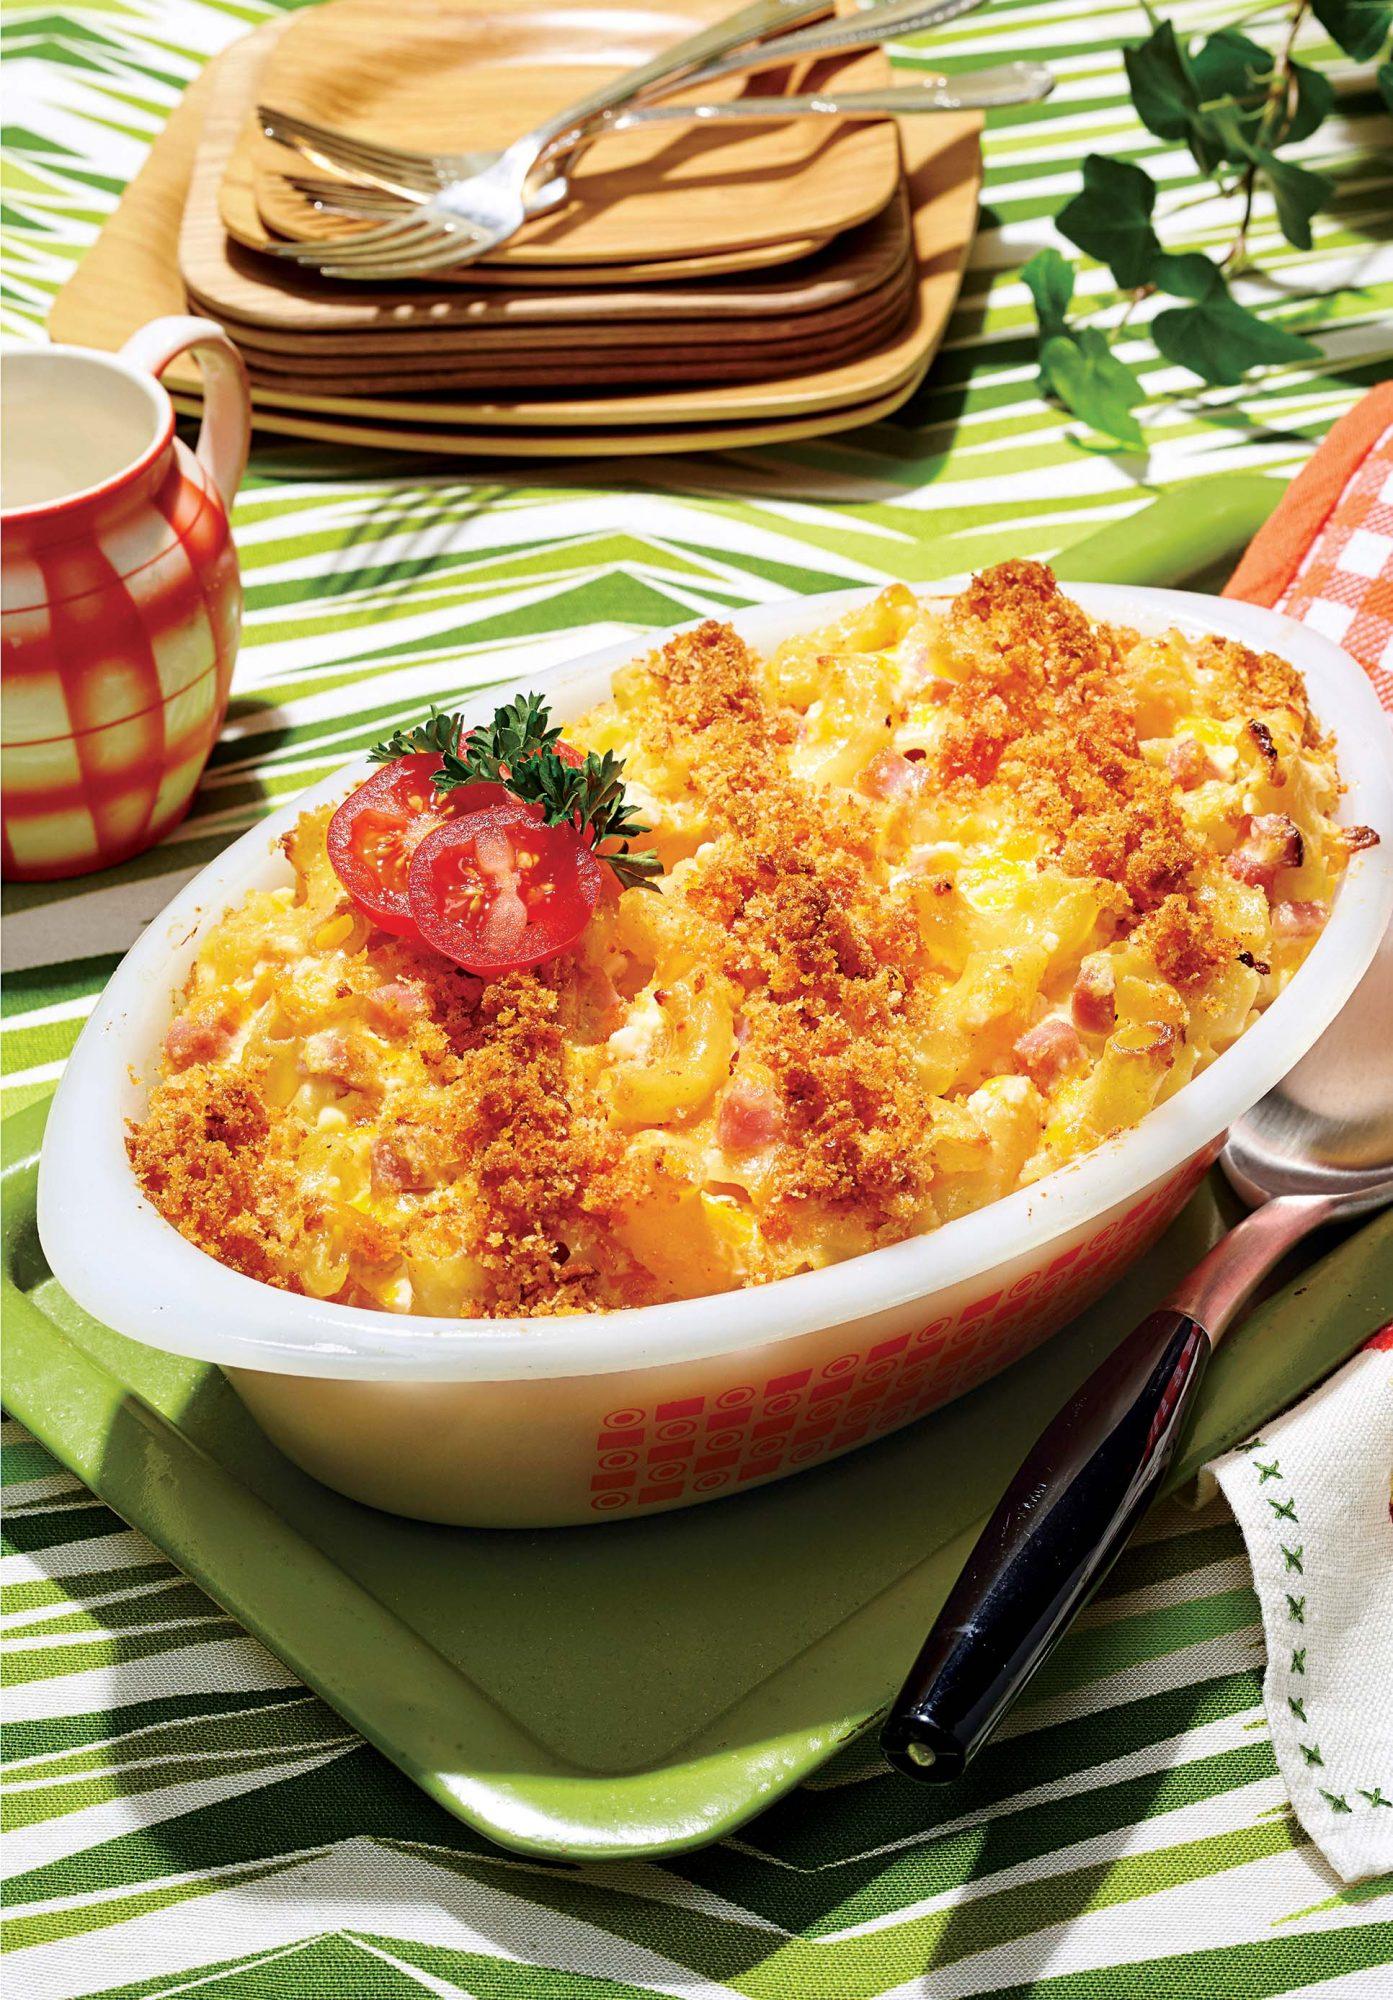 macaroni and cheese image